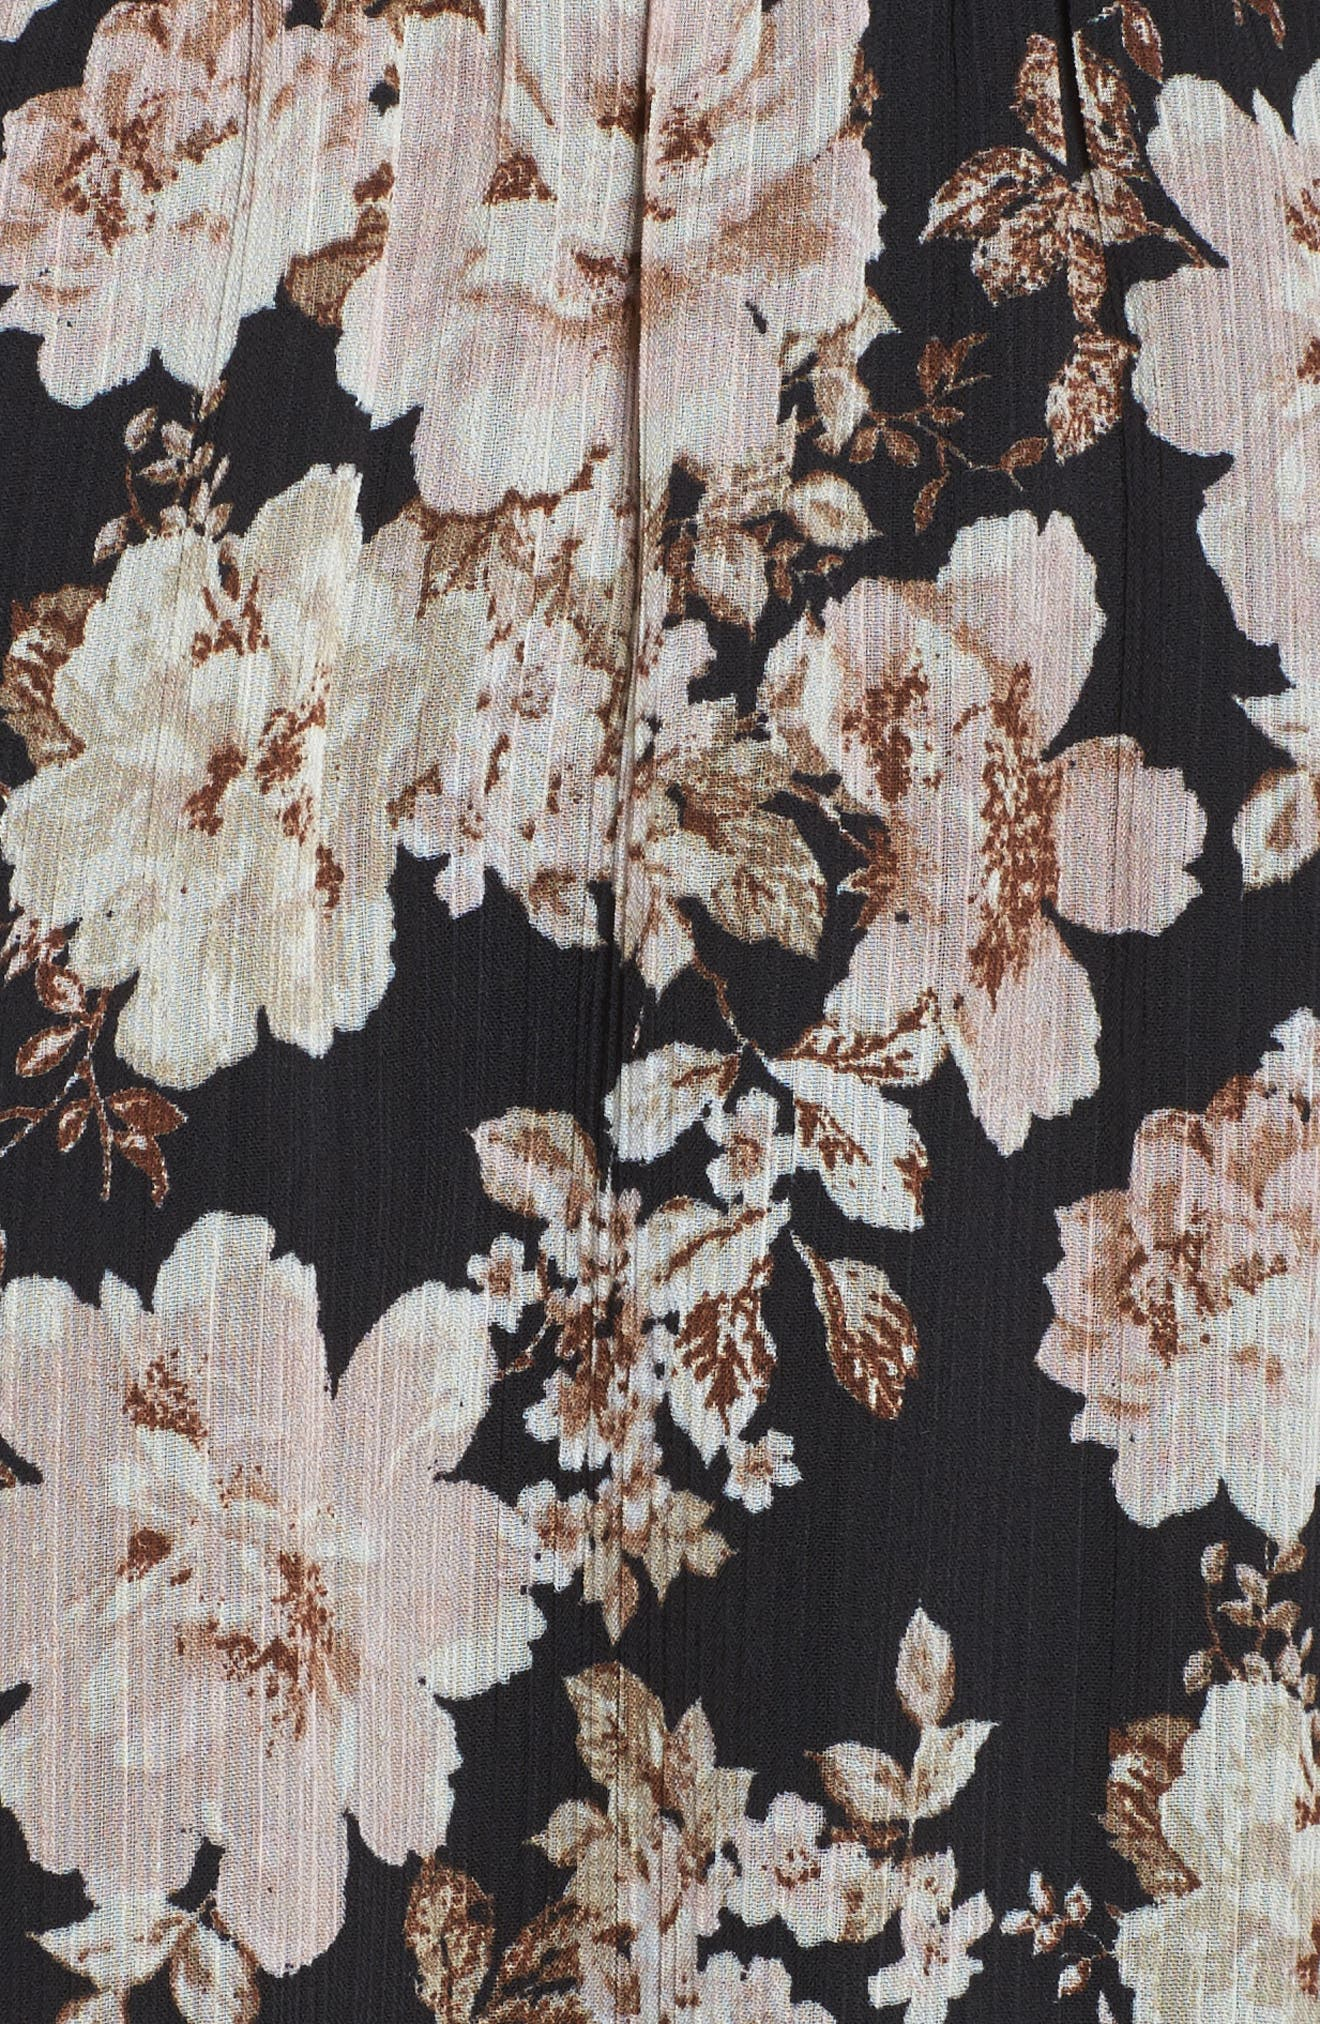 Floral Print Cross Back Dress,                             Alternate thumbnail 5, color,                             001